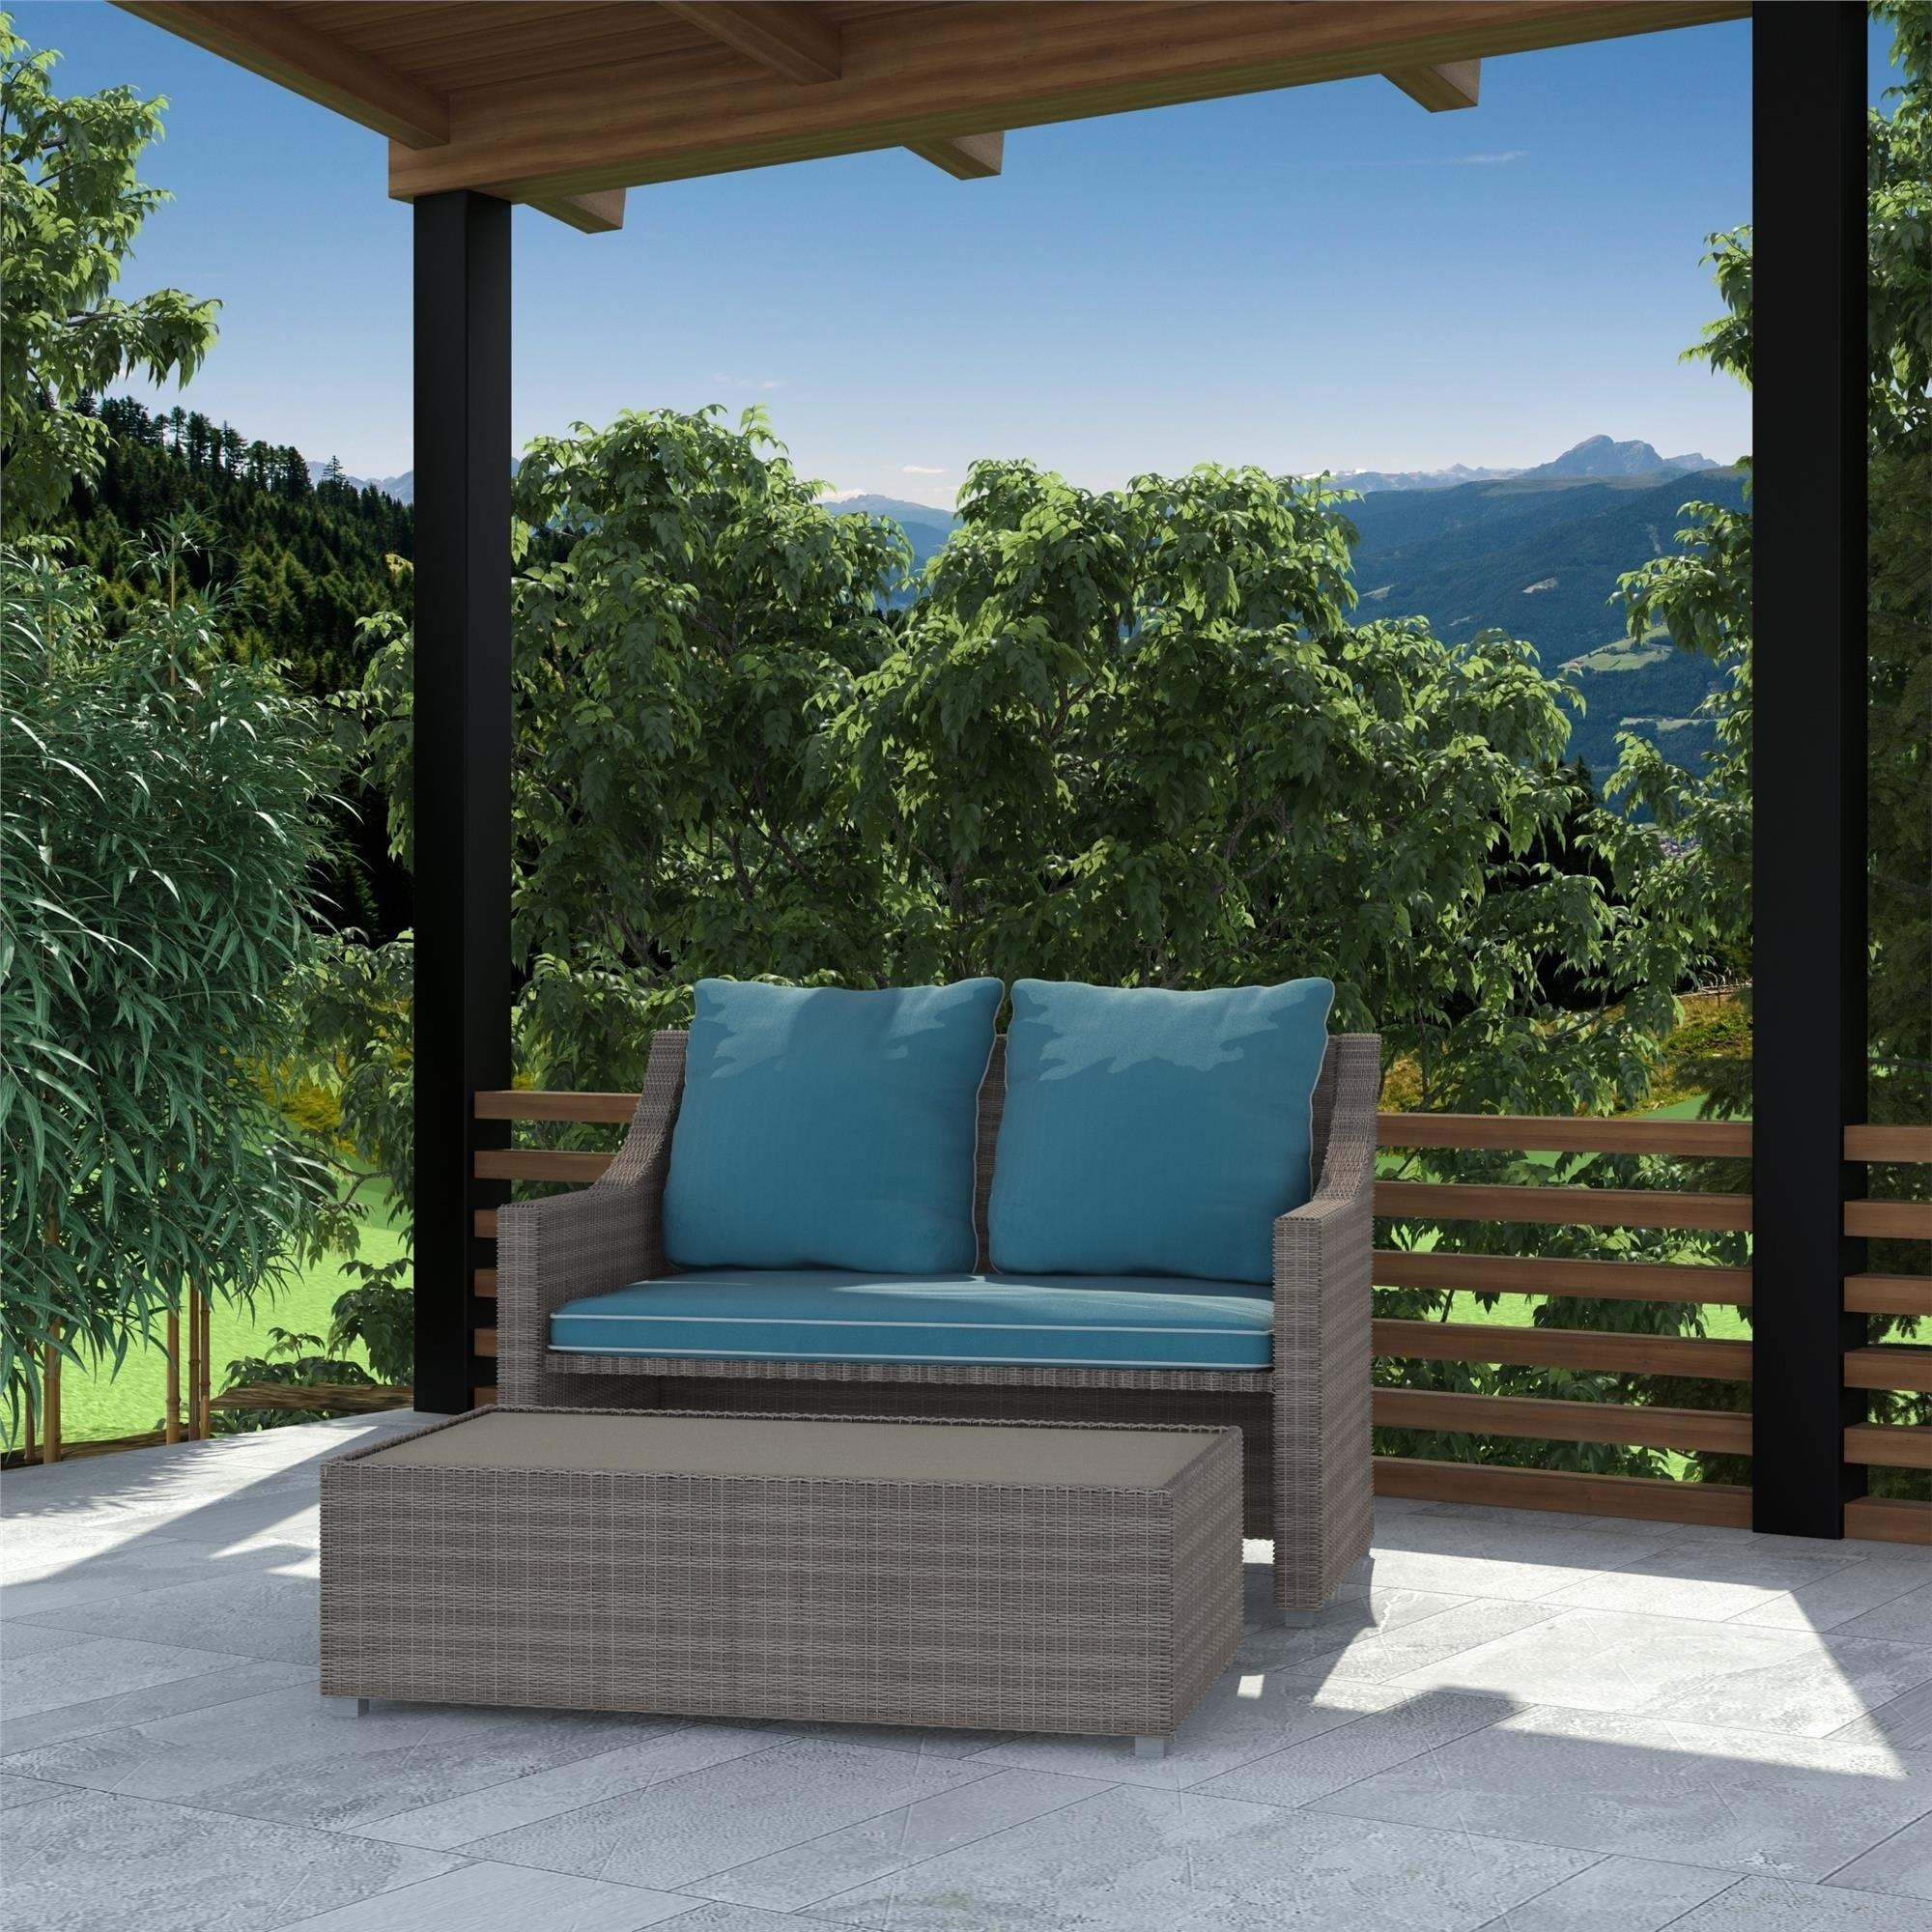 Excellent Cosco Outdoor Bluffs Grey 2 Piece Patio Loveseat And Ottoman Set Creativecarmelina Interior Chair Design Creativecarmelinacom